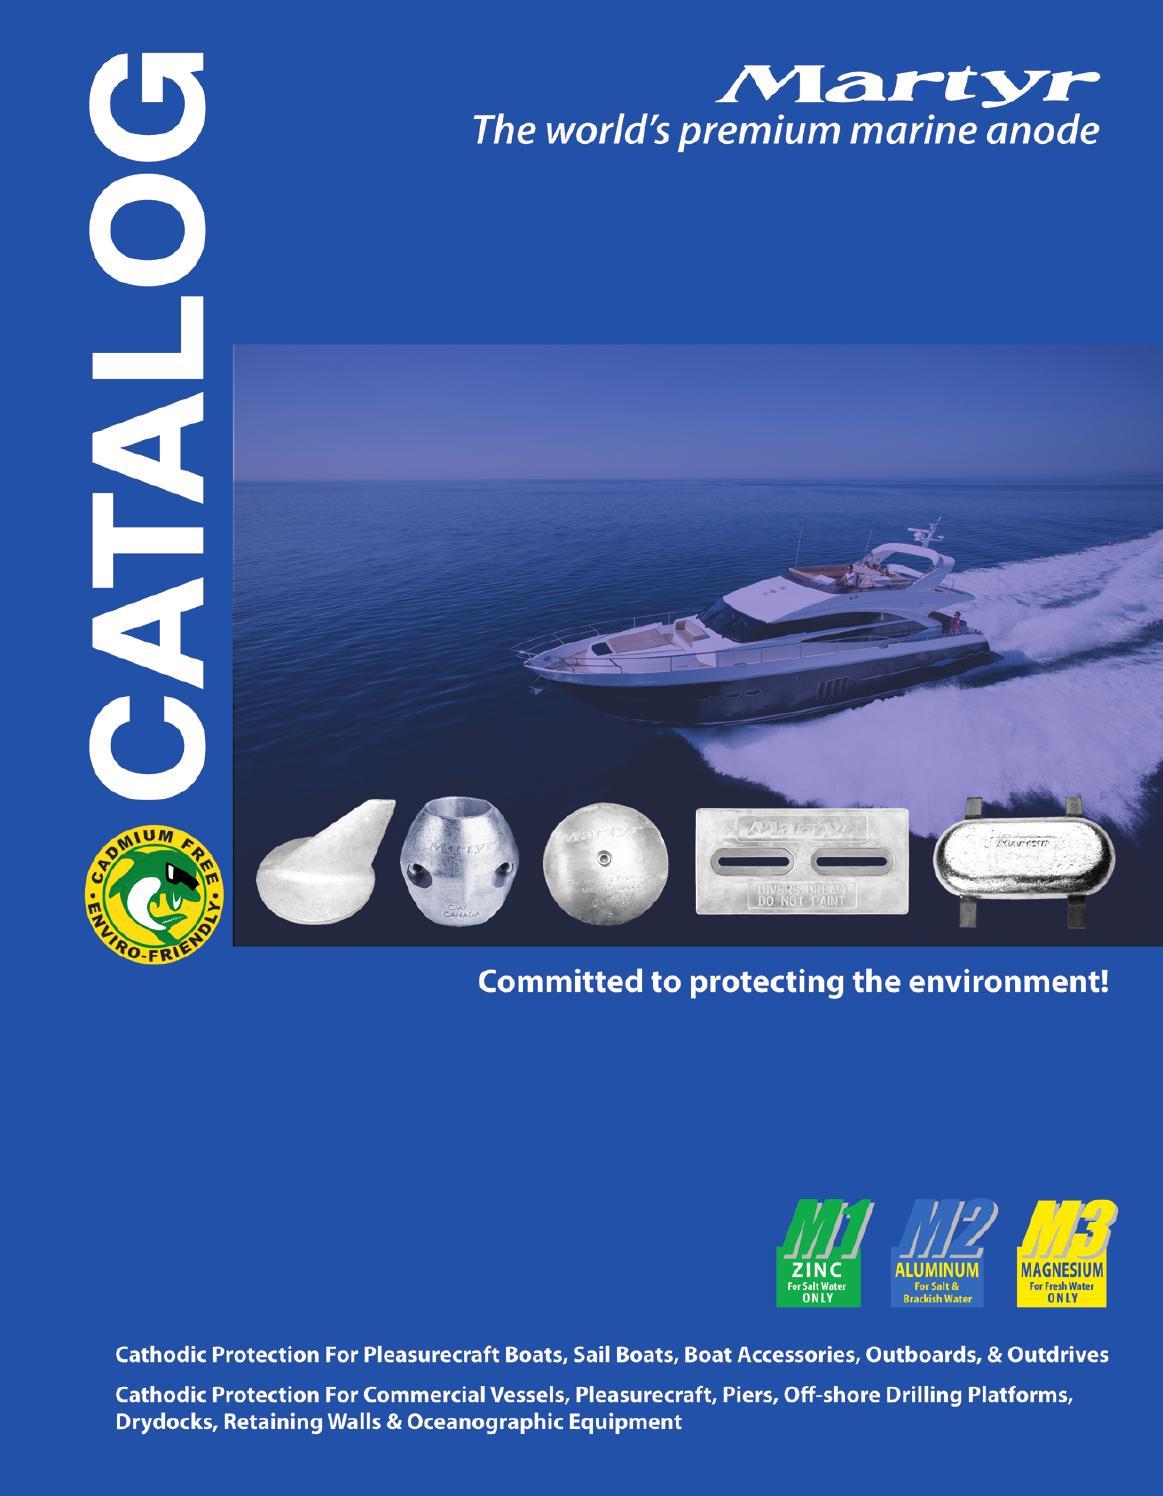 Aluminium 1.6Kg Bar Anode for yacht ship hull 305 x 76 x 41mm boat bolt on